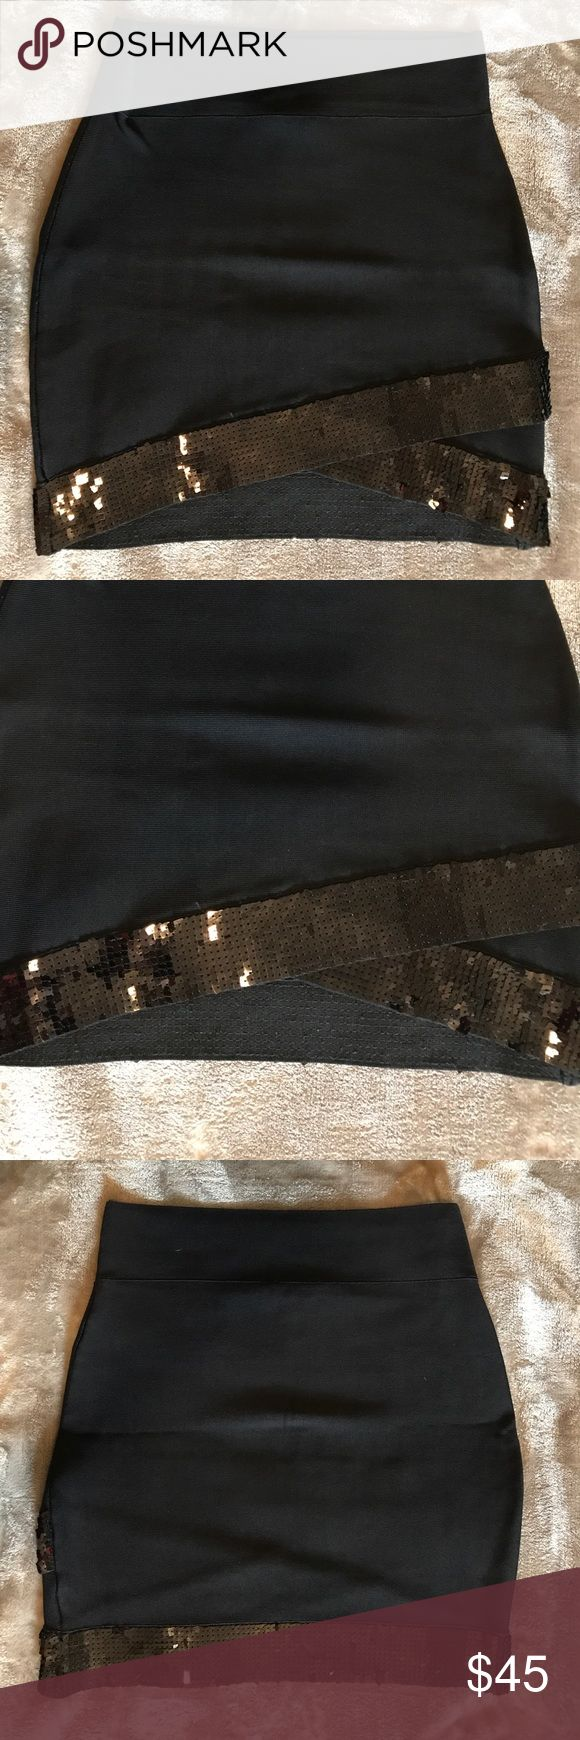 "BCBGMAXAZRIA bandage body con power skirt sequin Super stretchy. Total length 18"". Waist 14"" across laying flat. Smoke free home. BCBGMaxAzria Skirts Mini"